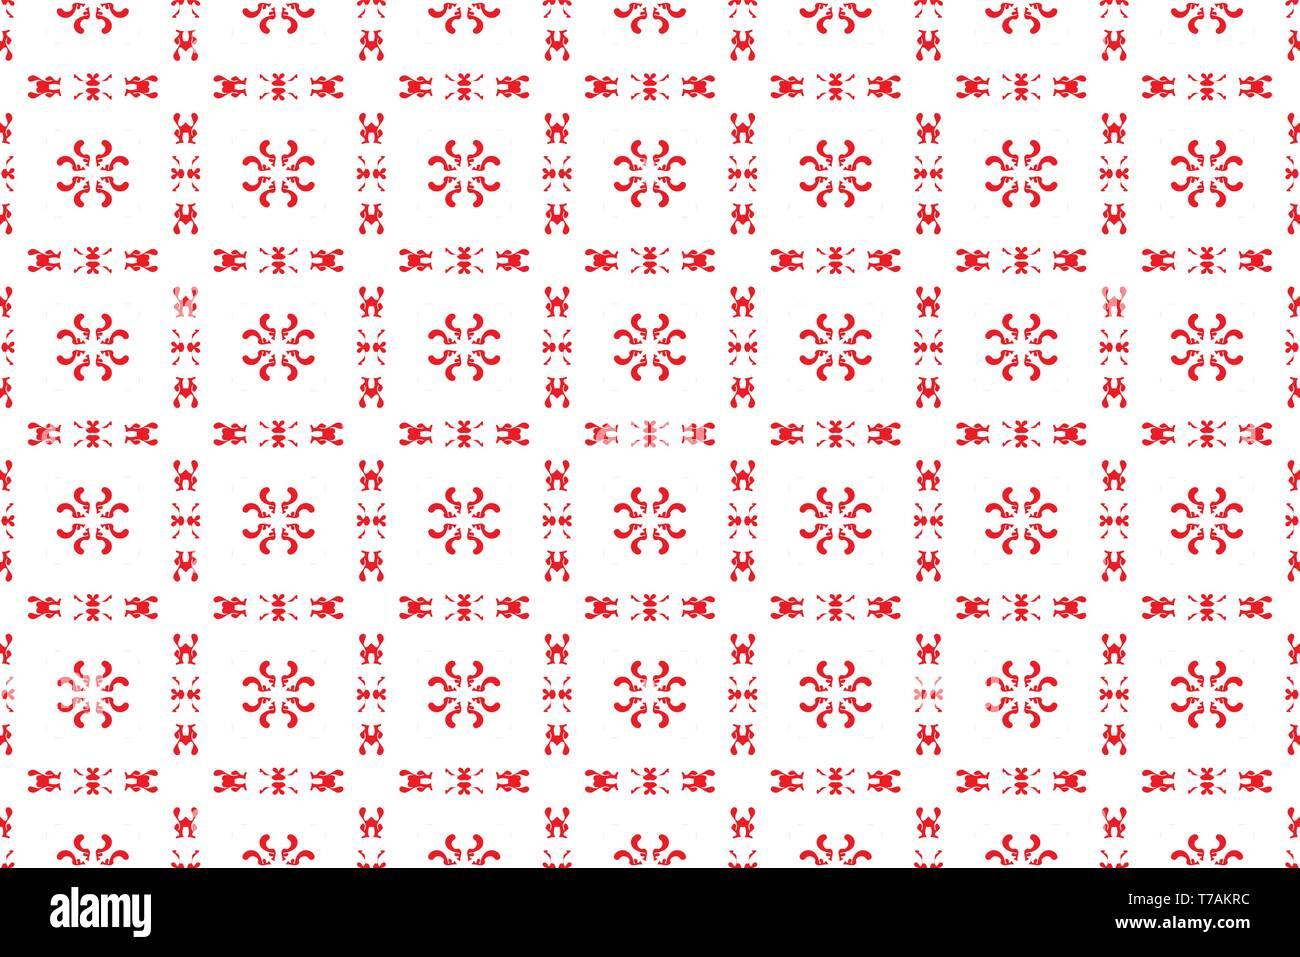 Ukrainian, Belarusian red embroidery seamless pattern - Vyshyvanka - Stock Image